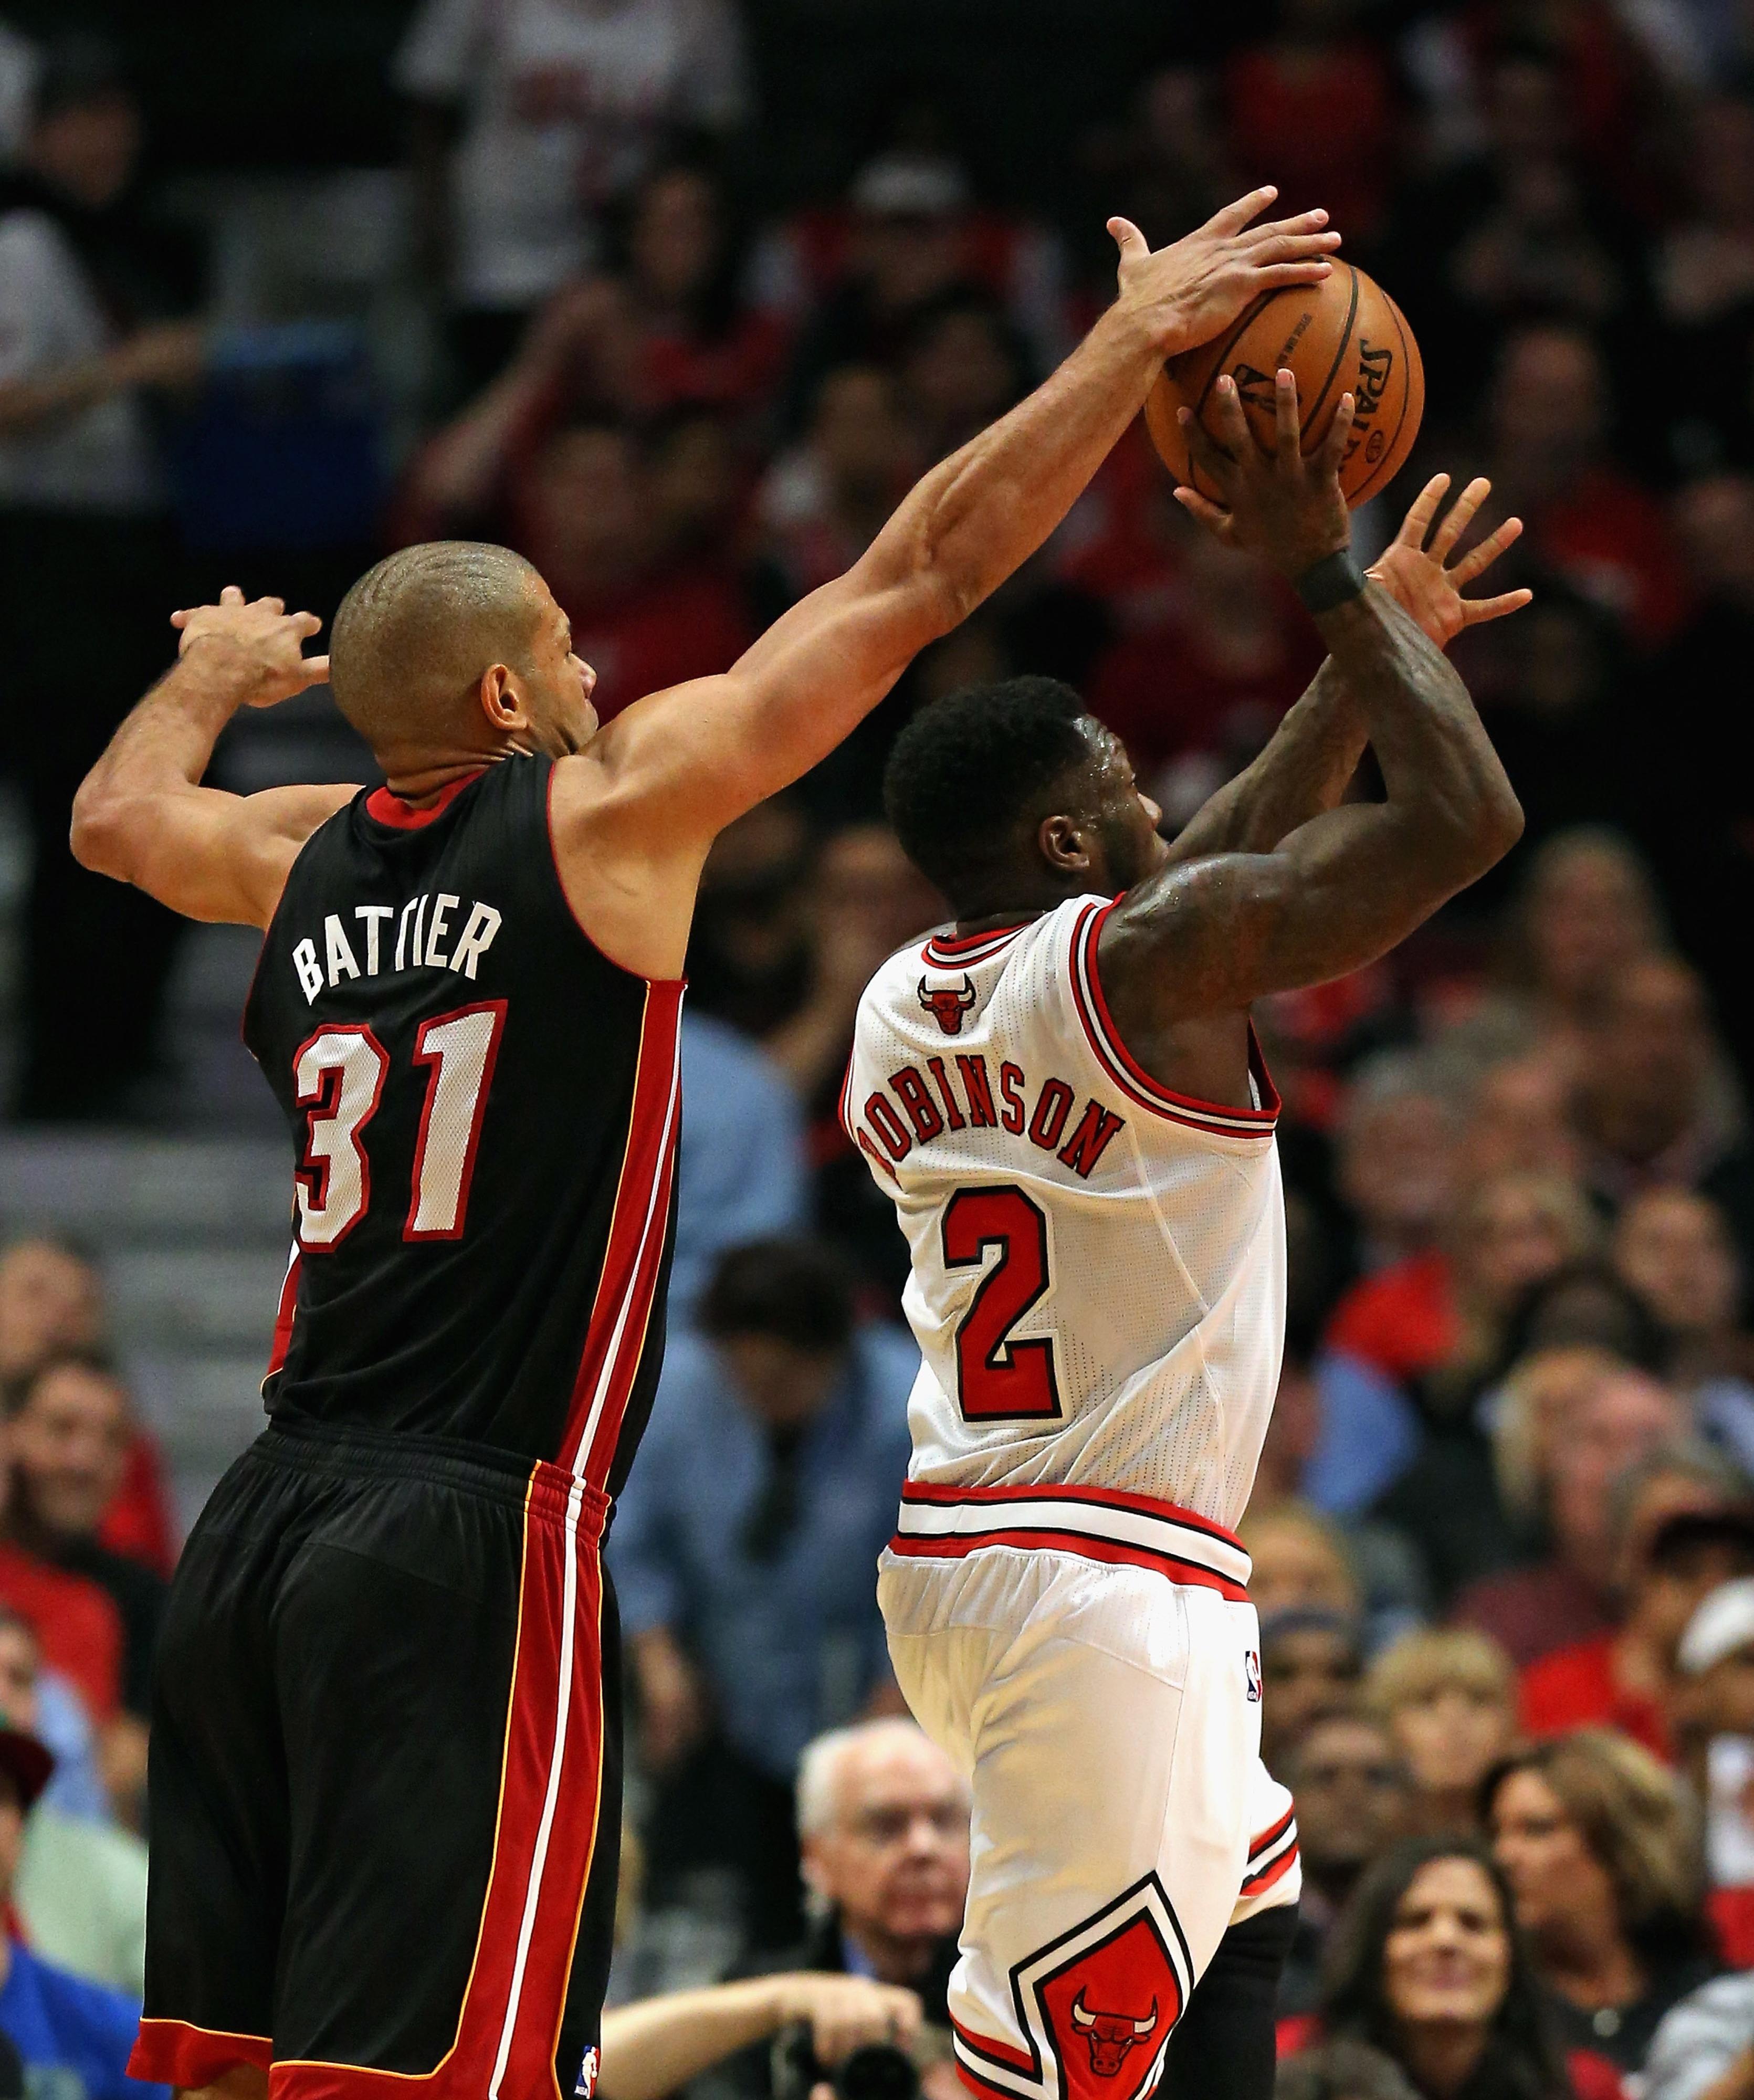 Heat vs. Bulls Game 4, NBA Playoffs 2013: Miami mashes frigid Chicago squad, 88-65